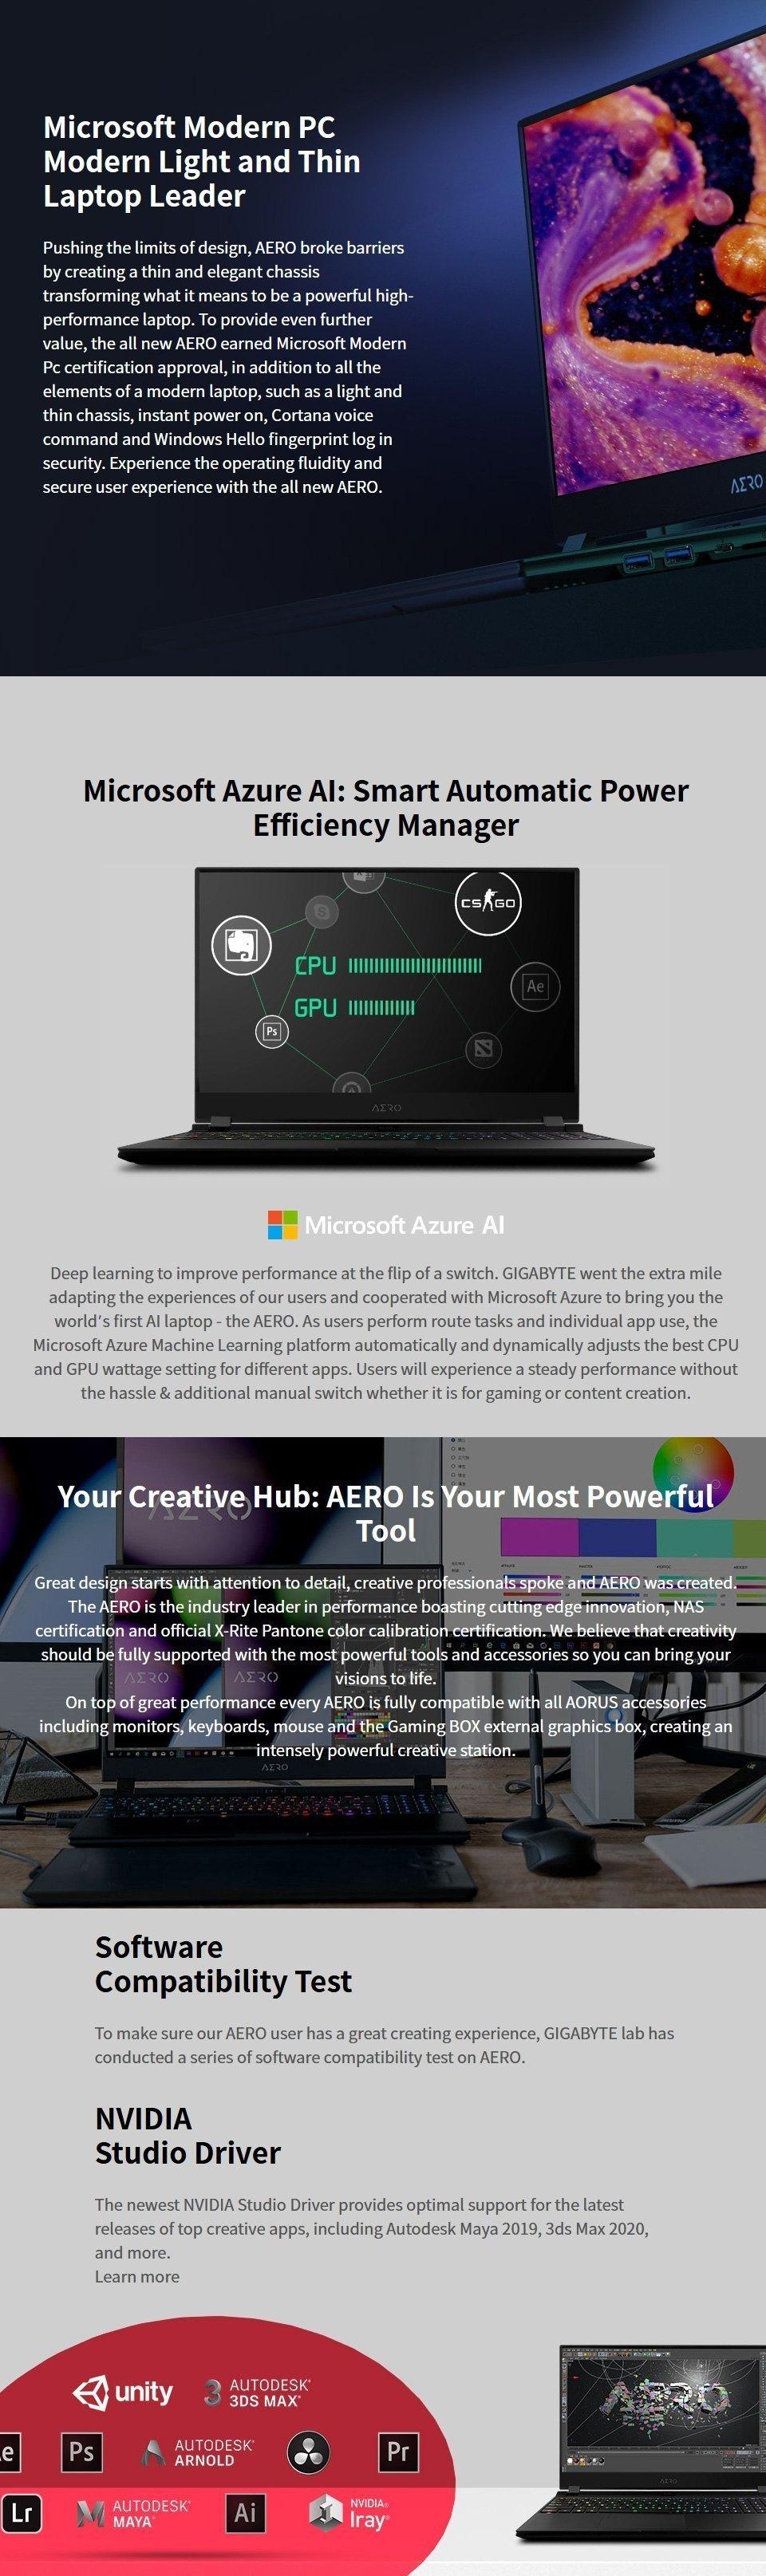 Gigabyte AERO 15 Core i7 RTX 2060 15.6in OLED UHD Laptop features 4